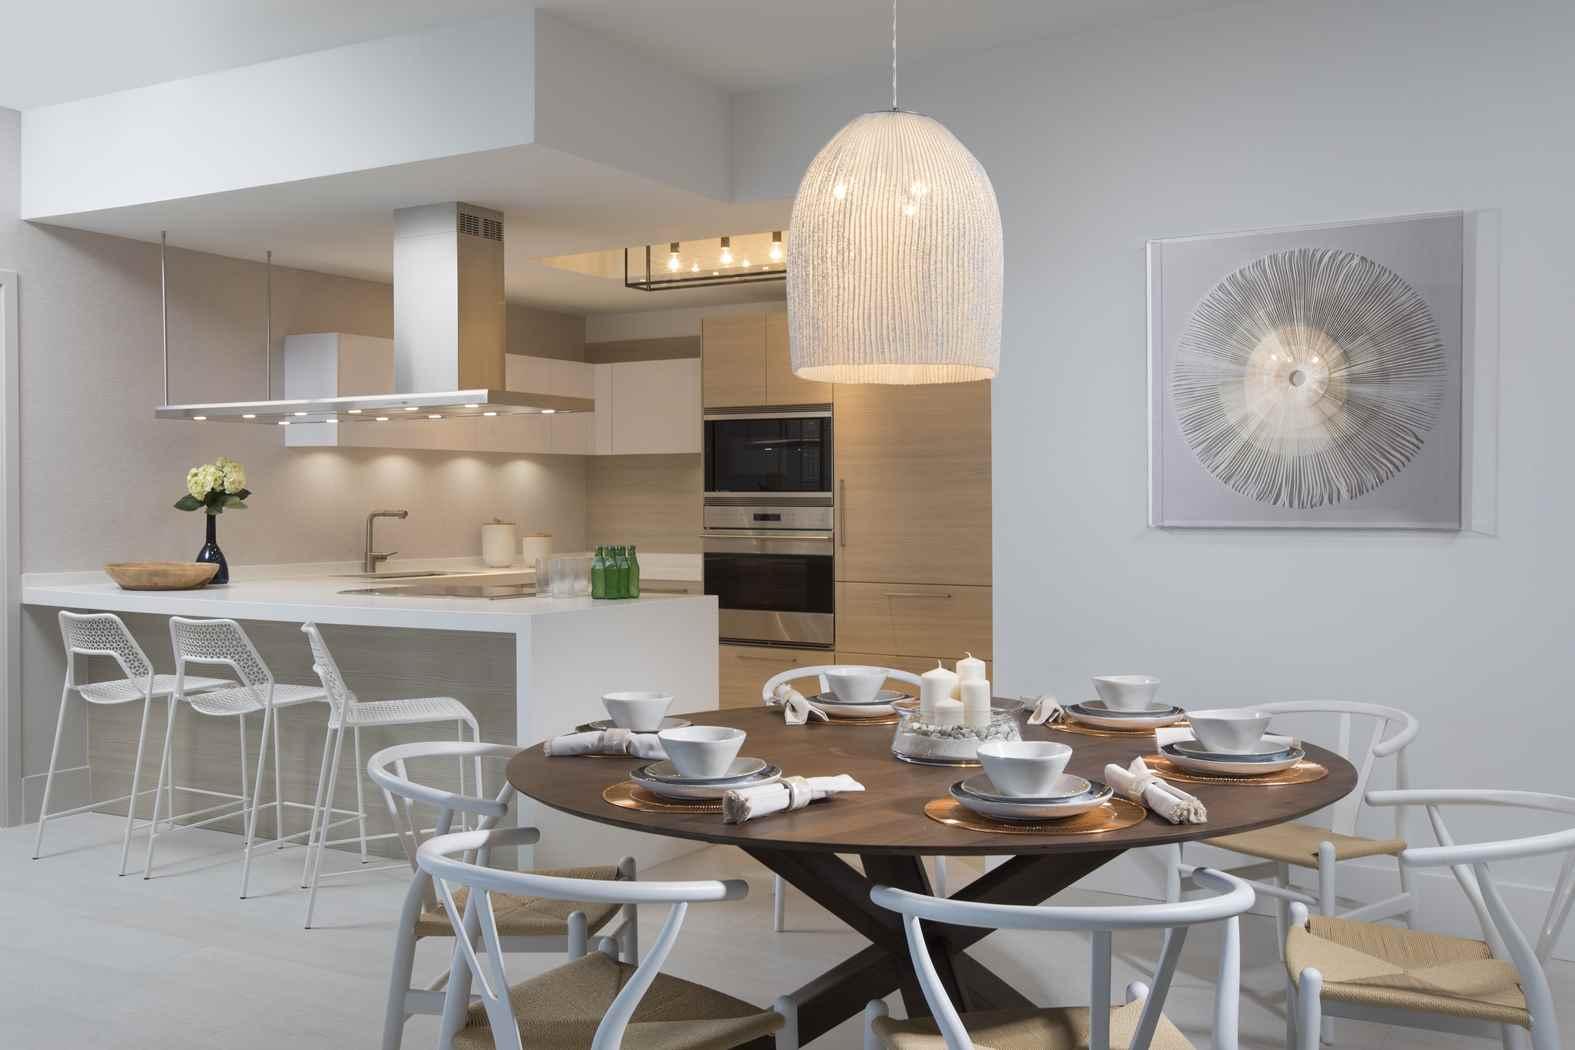 Modern Coastal Miami Condo - Residential Interior Design From DKOR ...